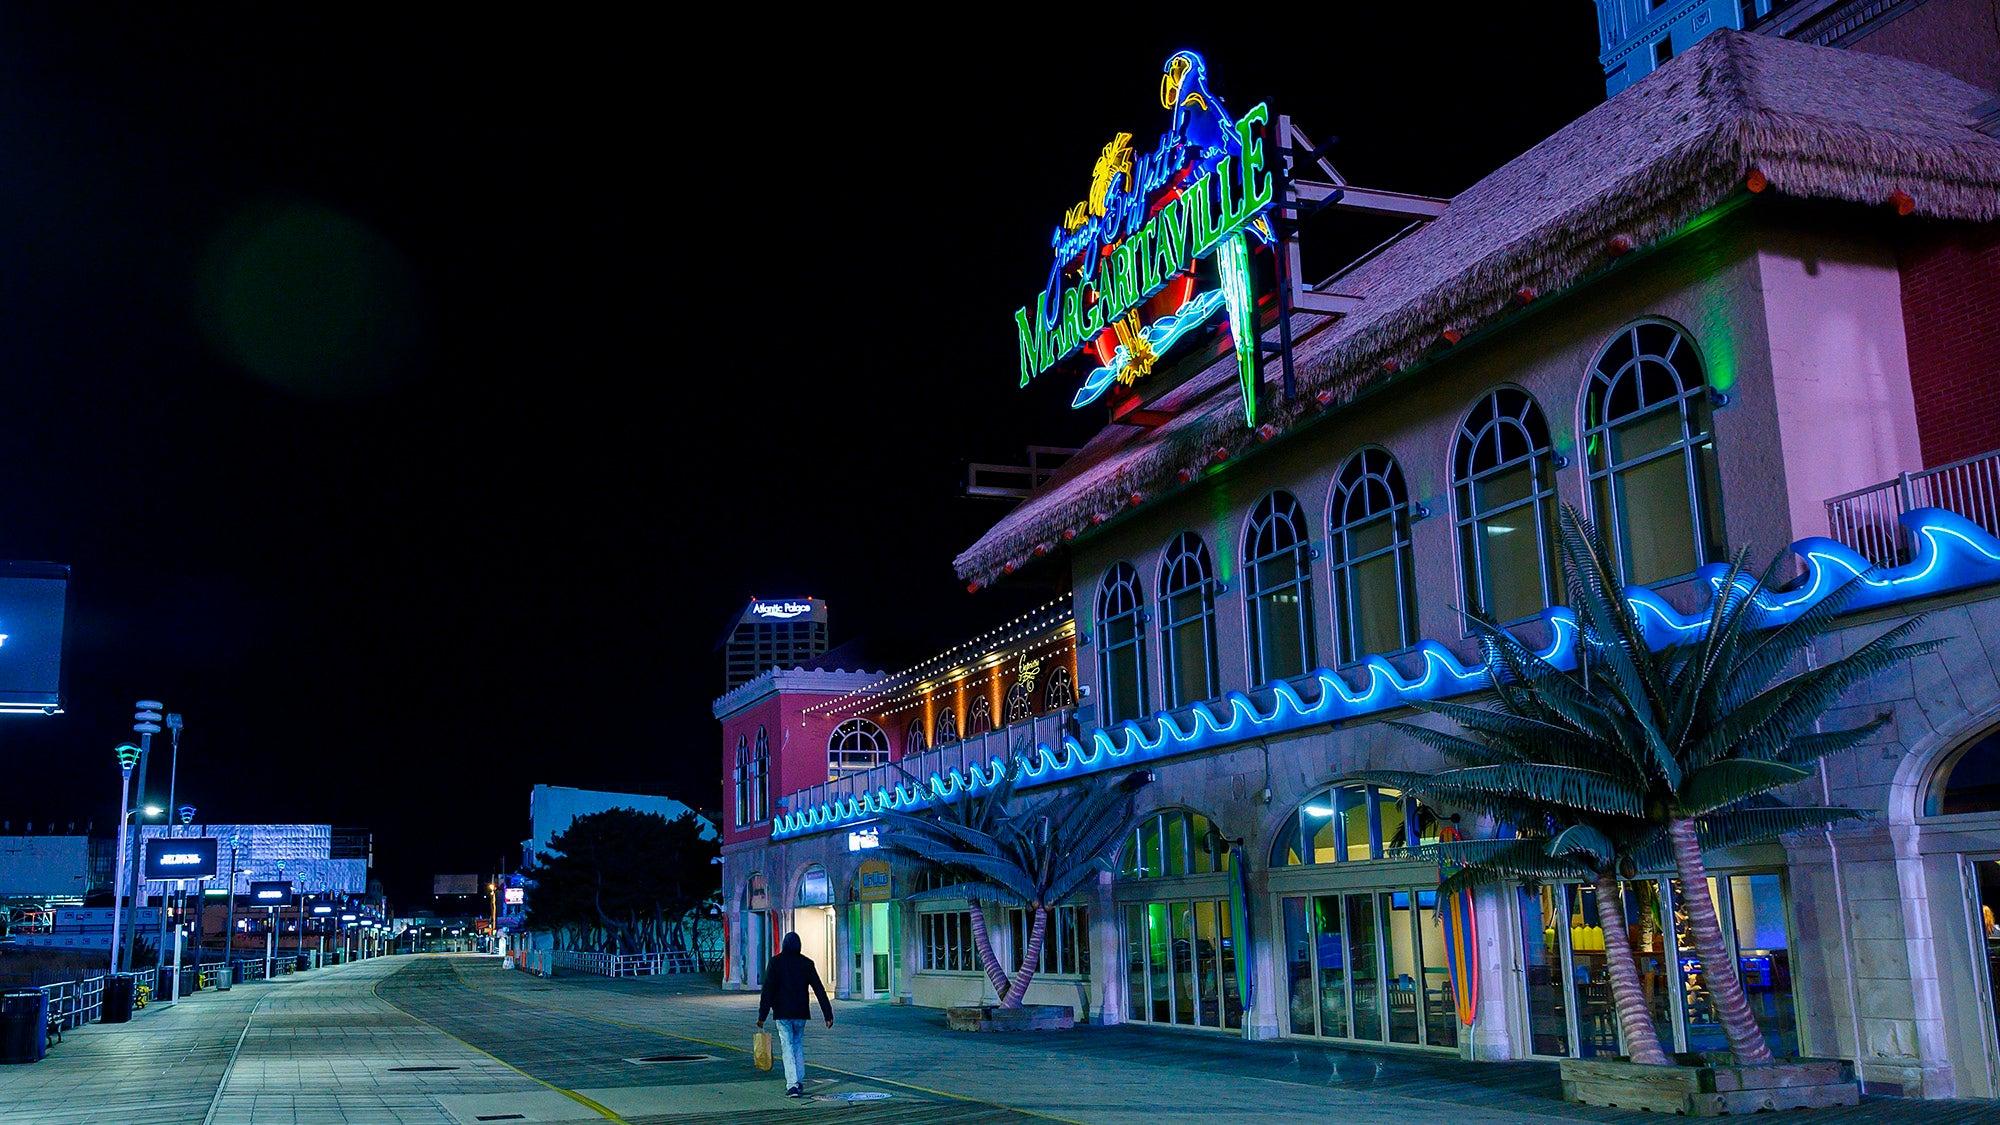 Margaritaville will open at Faneuil Hall in October 1